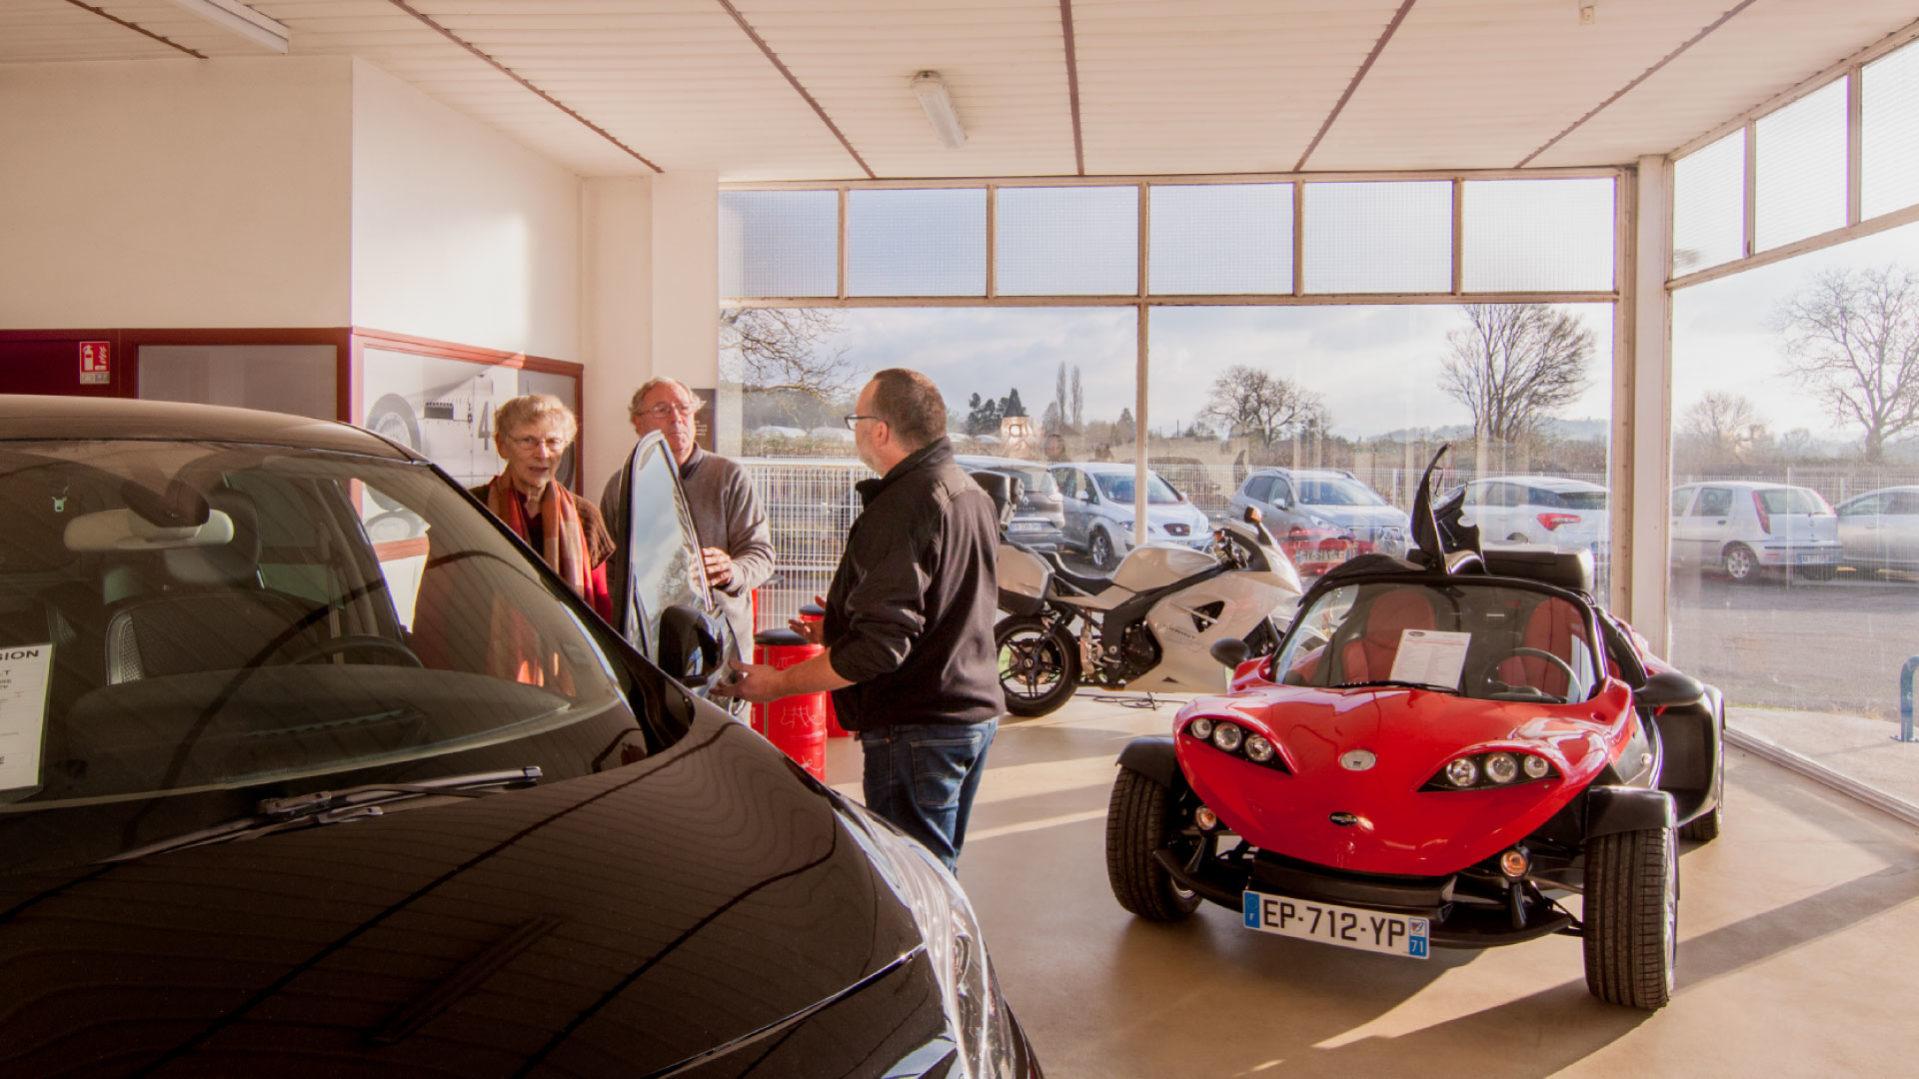 interieur-salle-exposition-vehicule-garage-de-cormatin